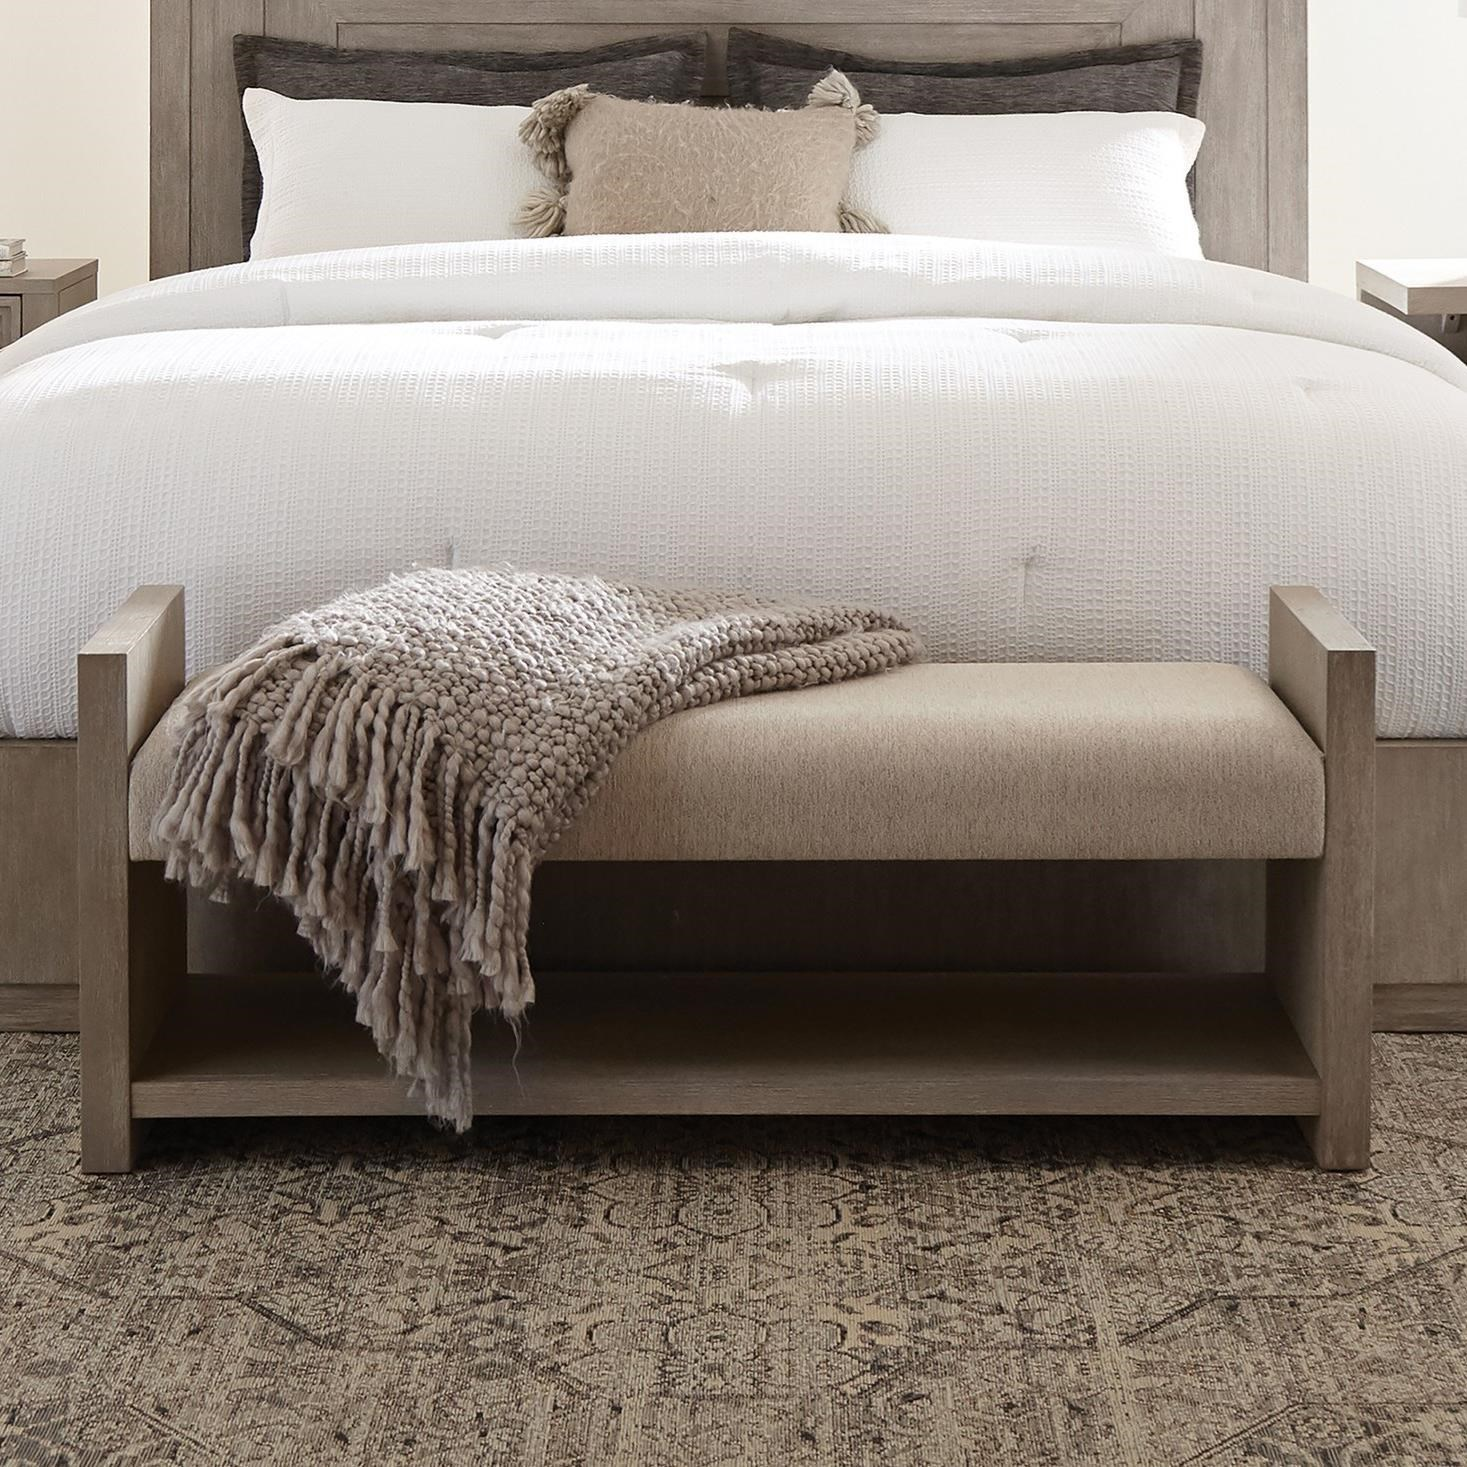 Cascade Upholstered Bed Bench by Riverside Furniture at Turk Furniture